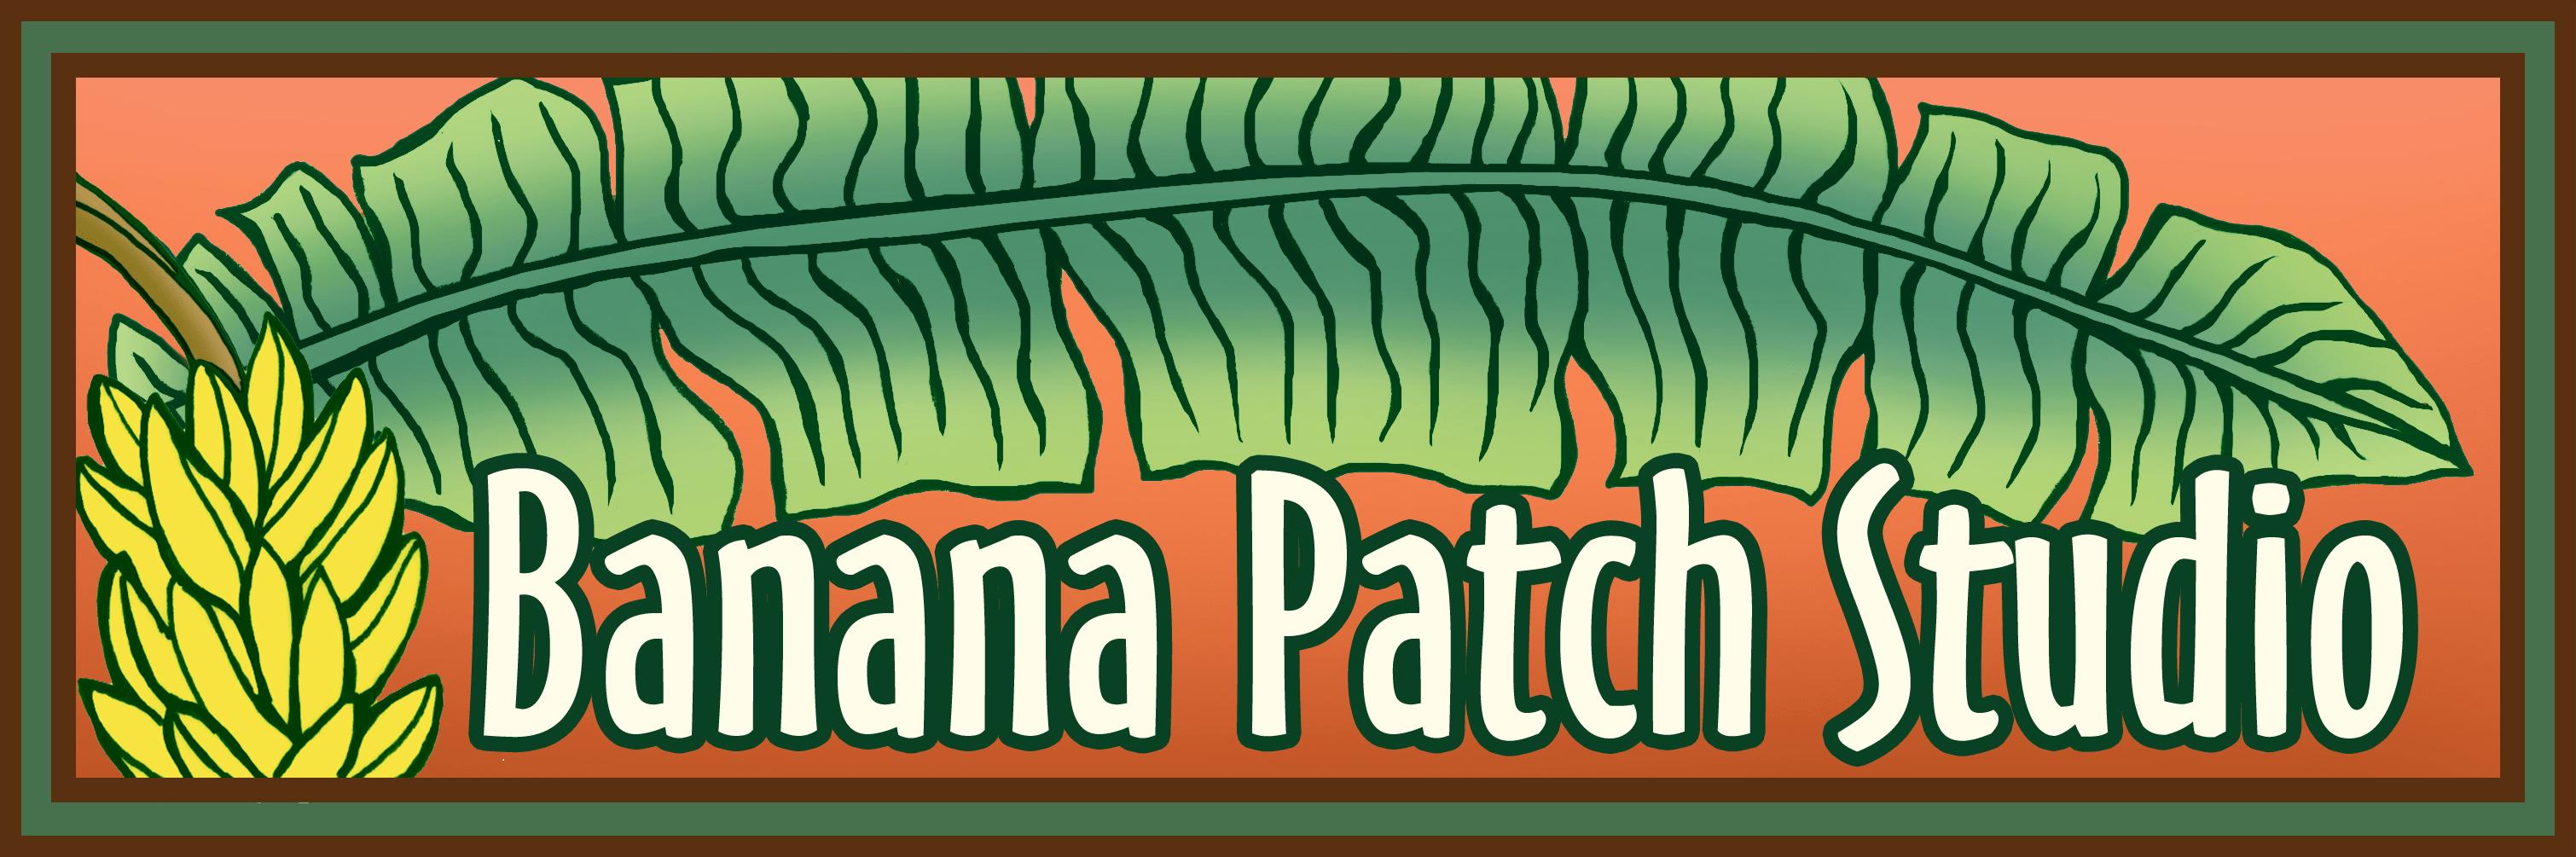 Banana Patch Studio